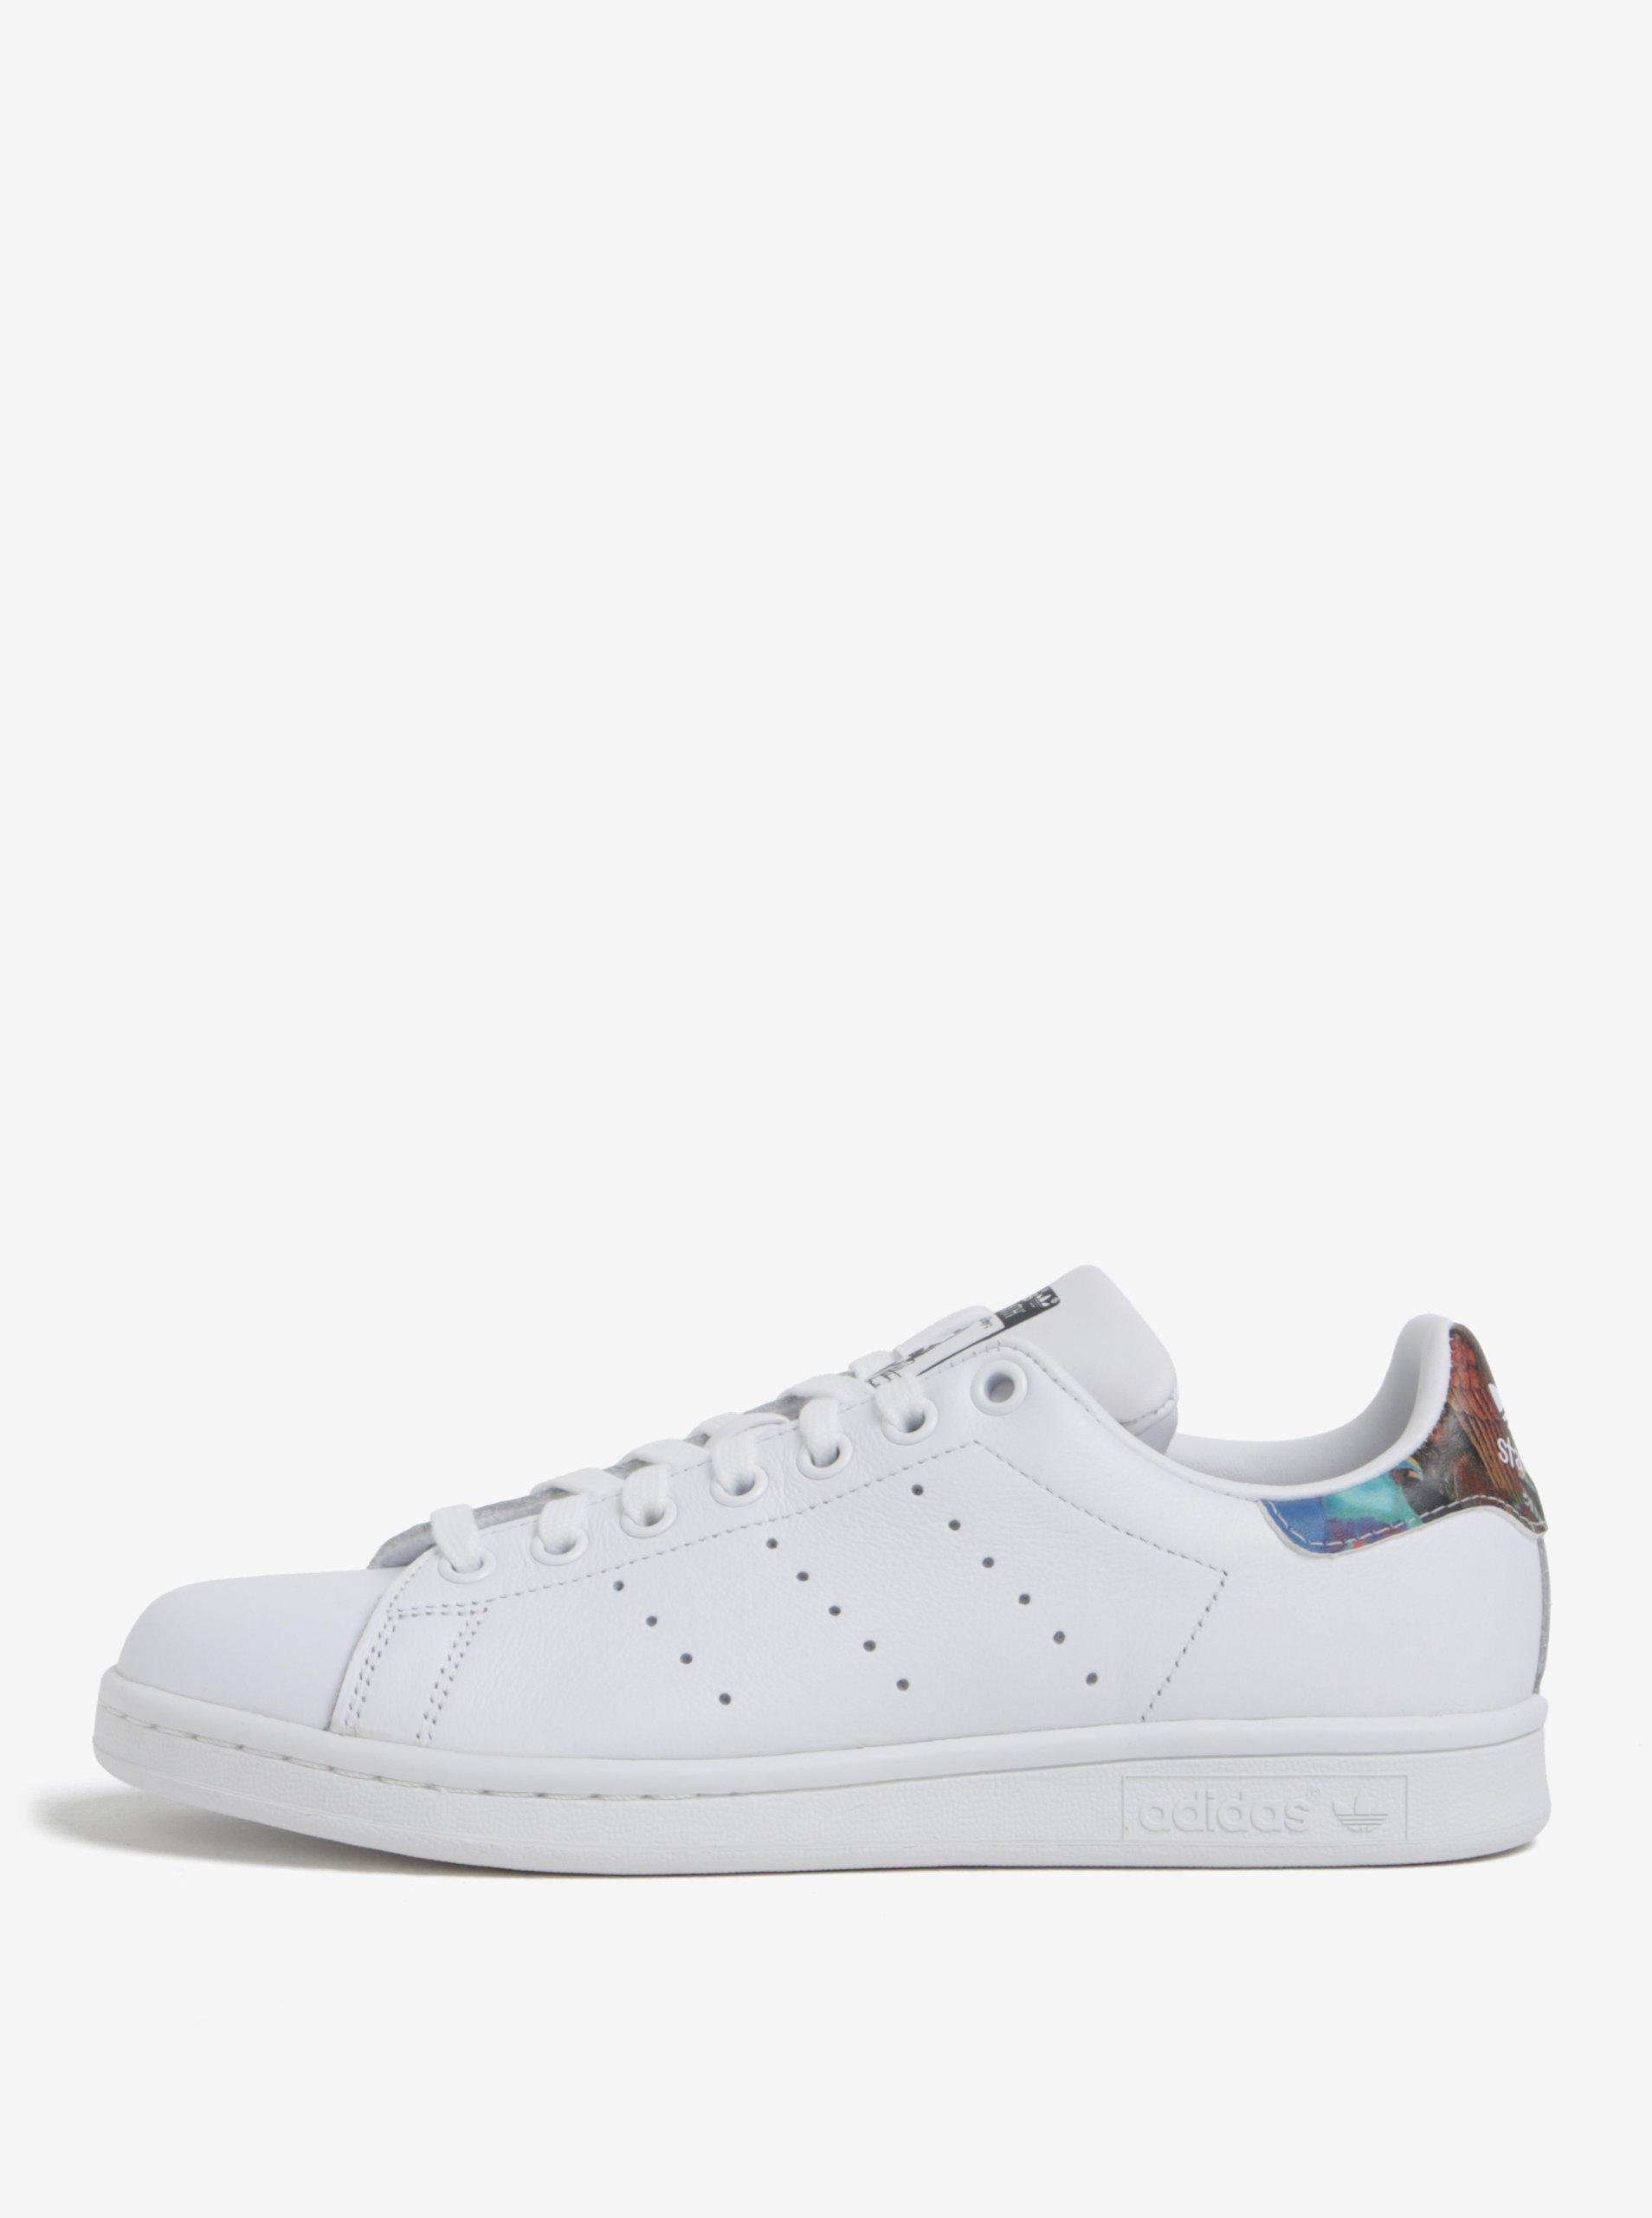 839f30cf15525 Biele dámske tenisky s farebným detailom adidas Originals Stan Smith ...